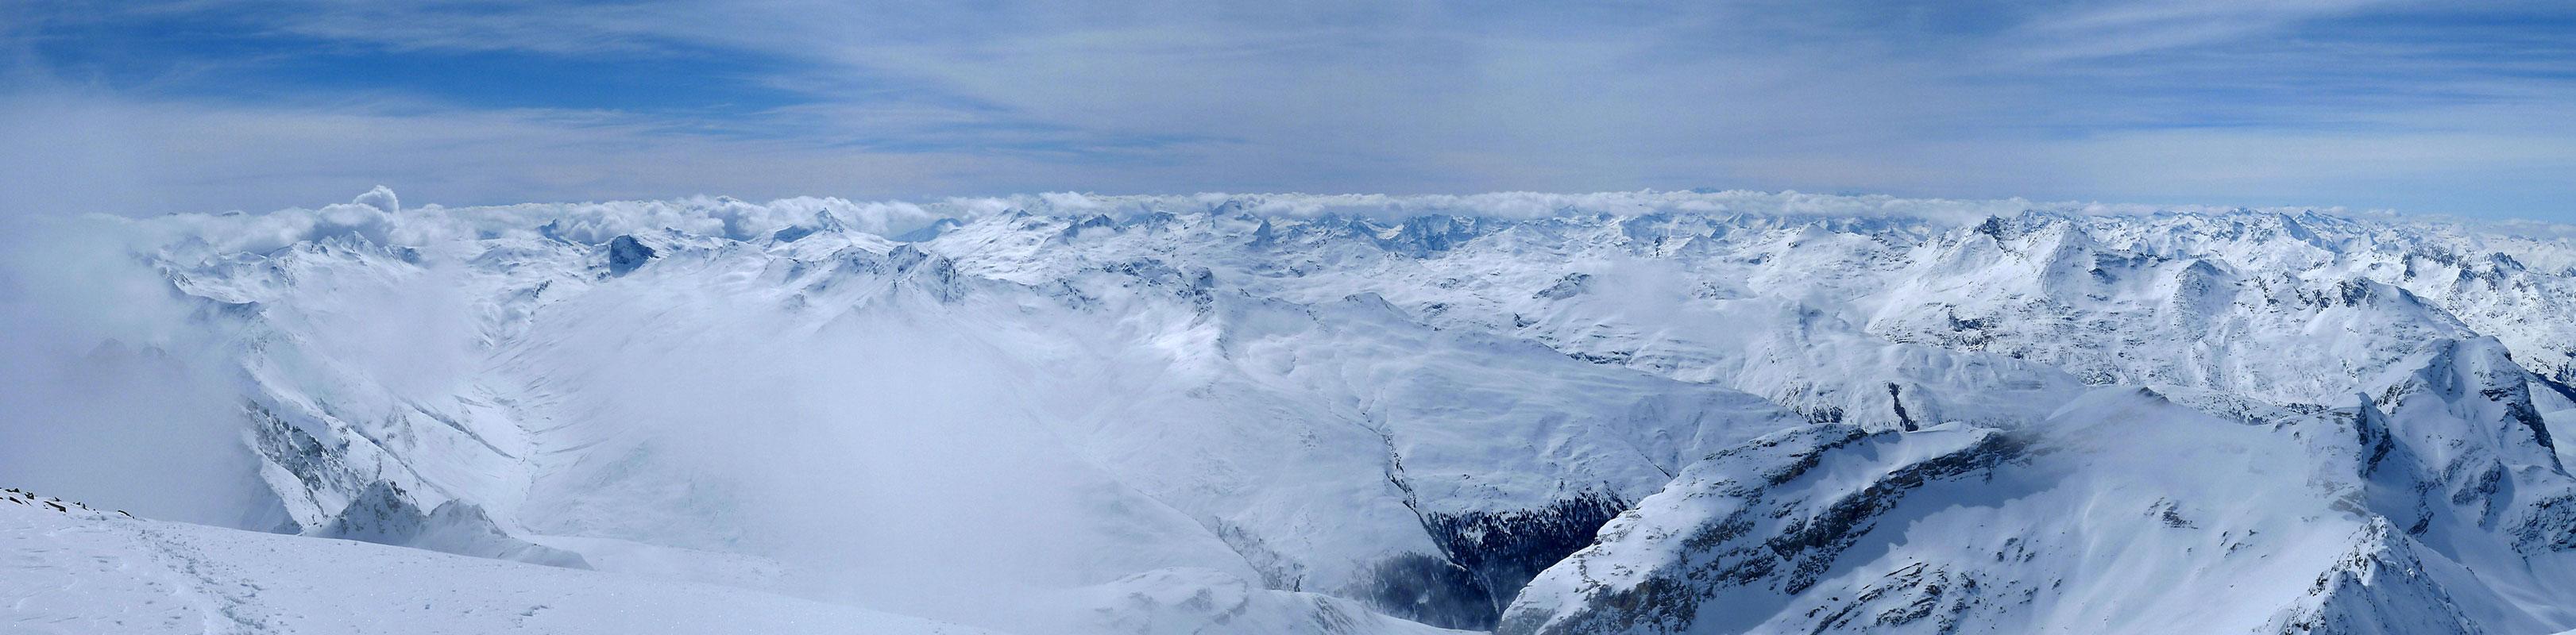 Piz Platta Plattagruppe / Oberhalbstein Switzerland panorama 01